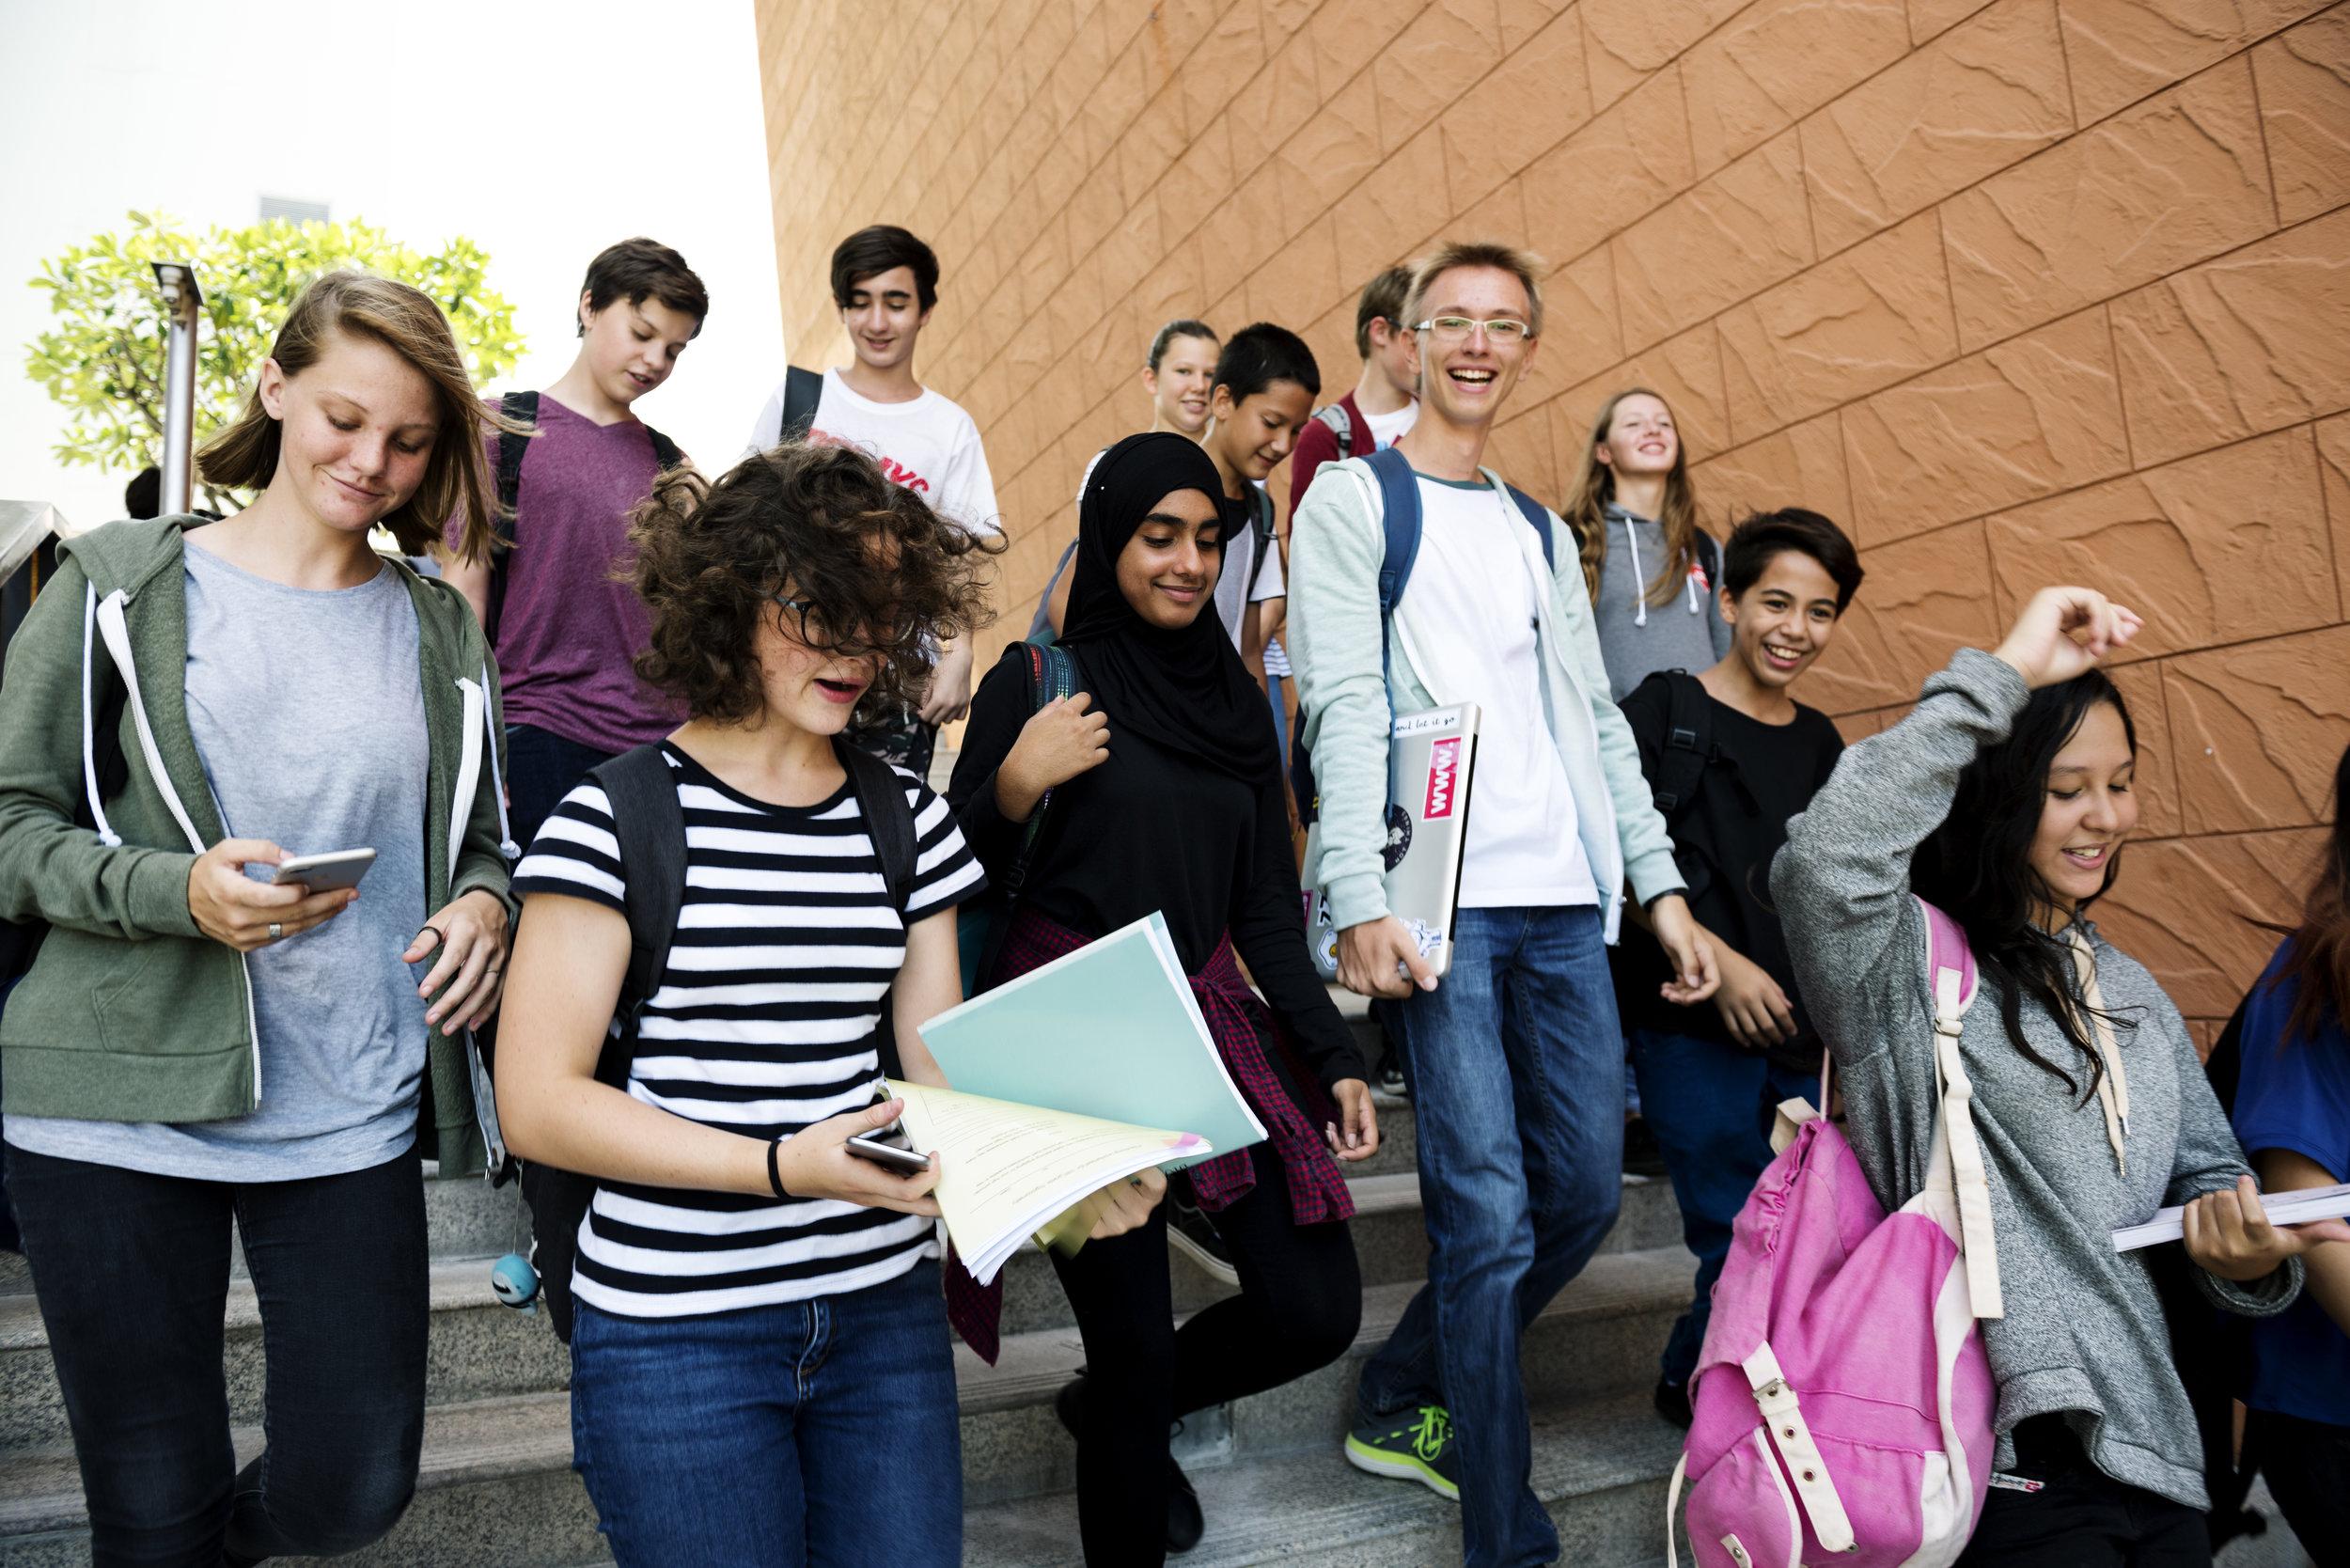 group-of-school-friends-walking-down-staircase-P2CRNZ3.jpg